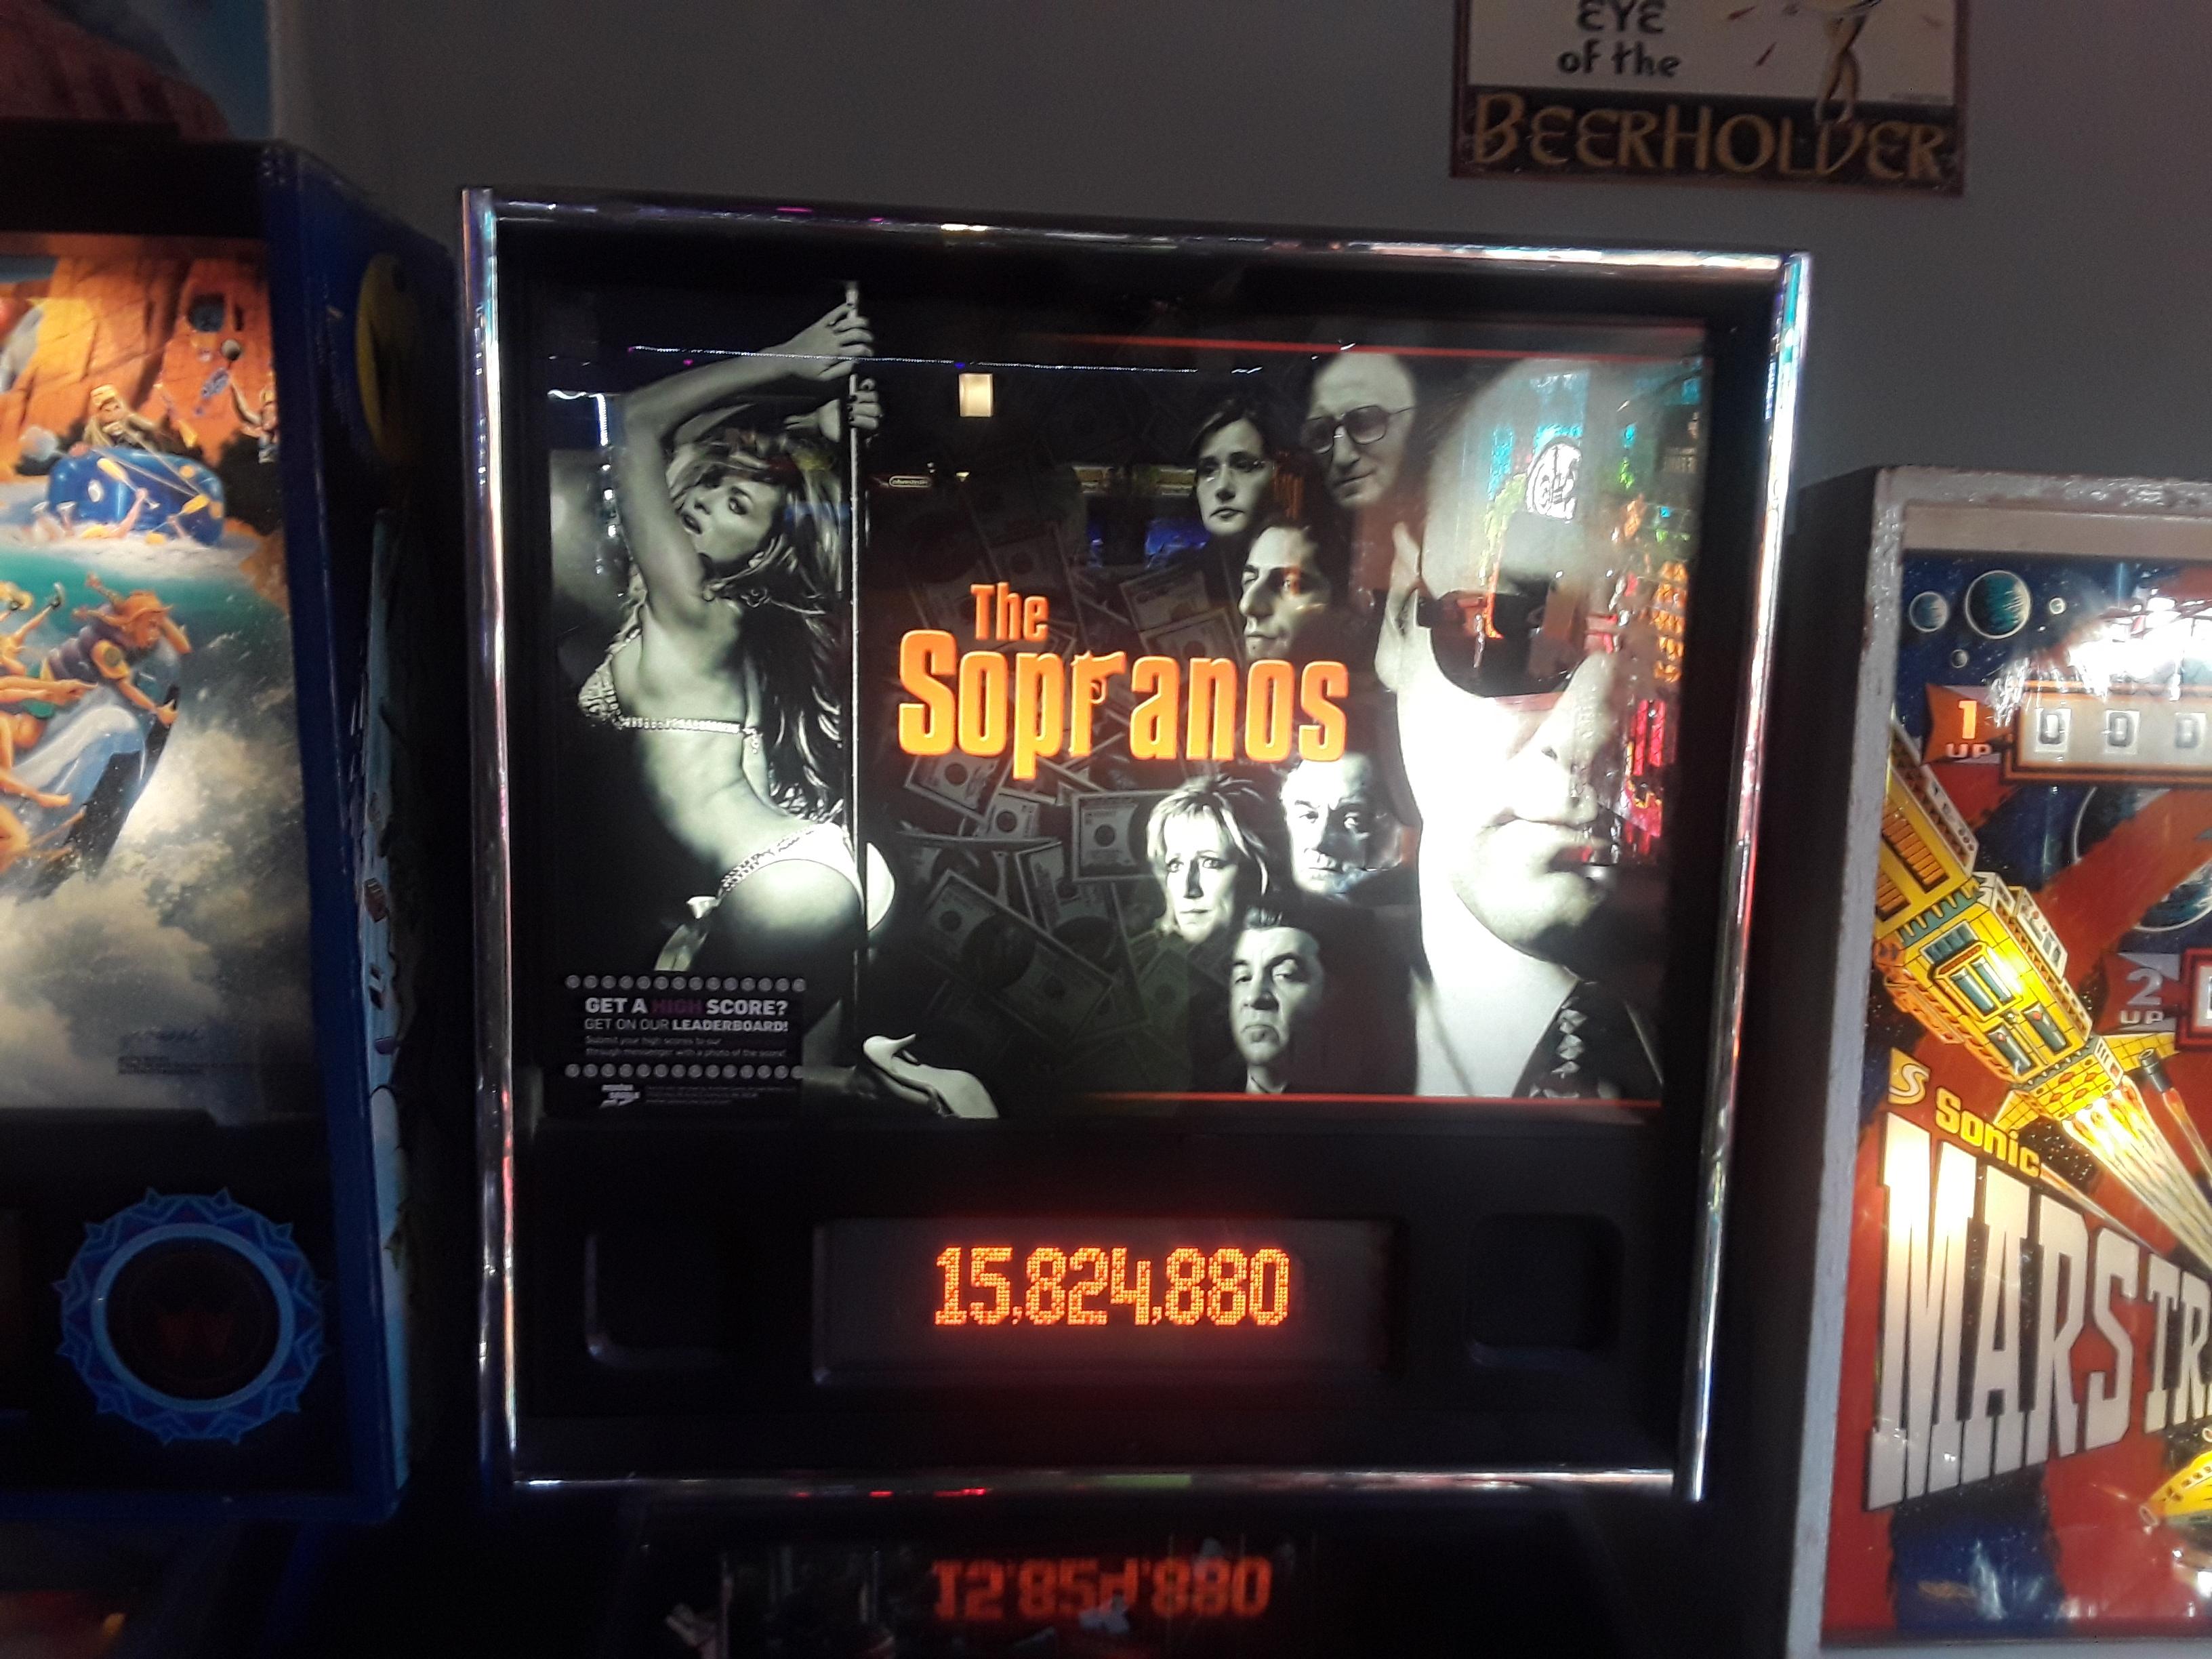 JML101582: The Sopranos (Pinball: 3 Balls) 15,824,880 points on 2018-10-14 23:10:28